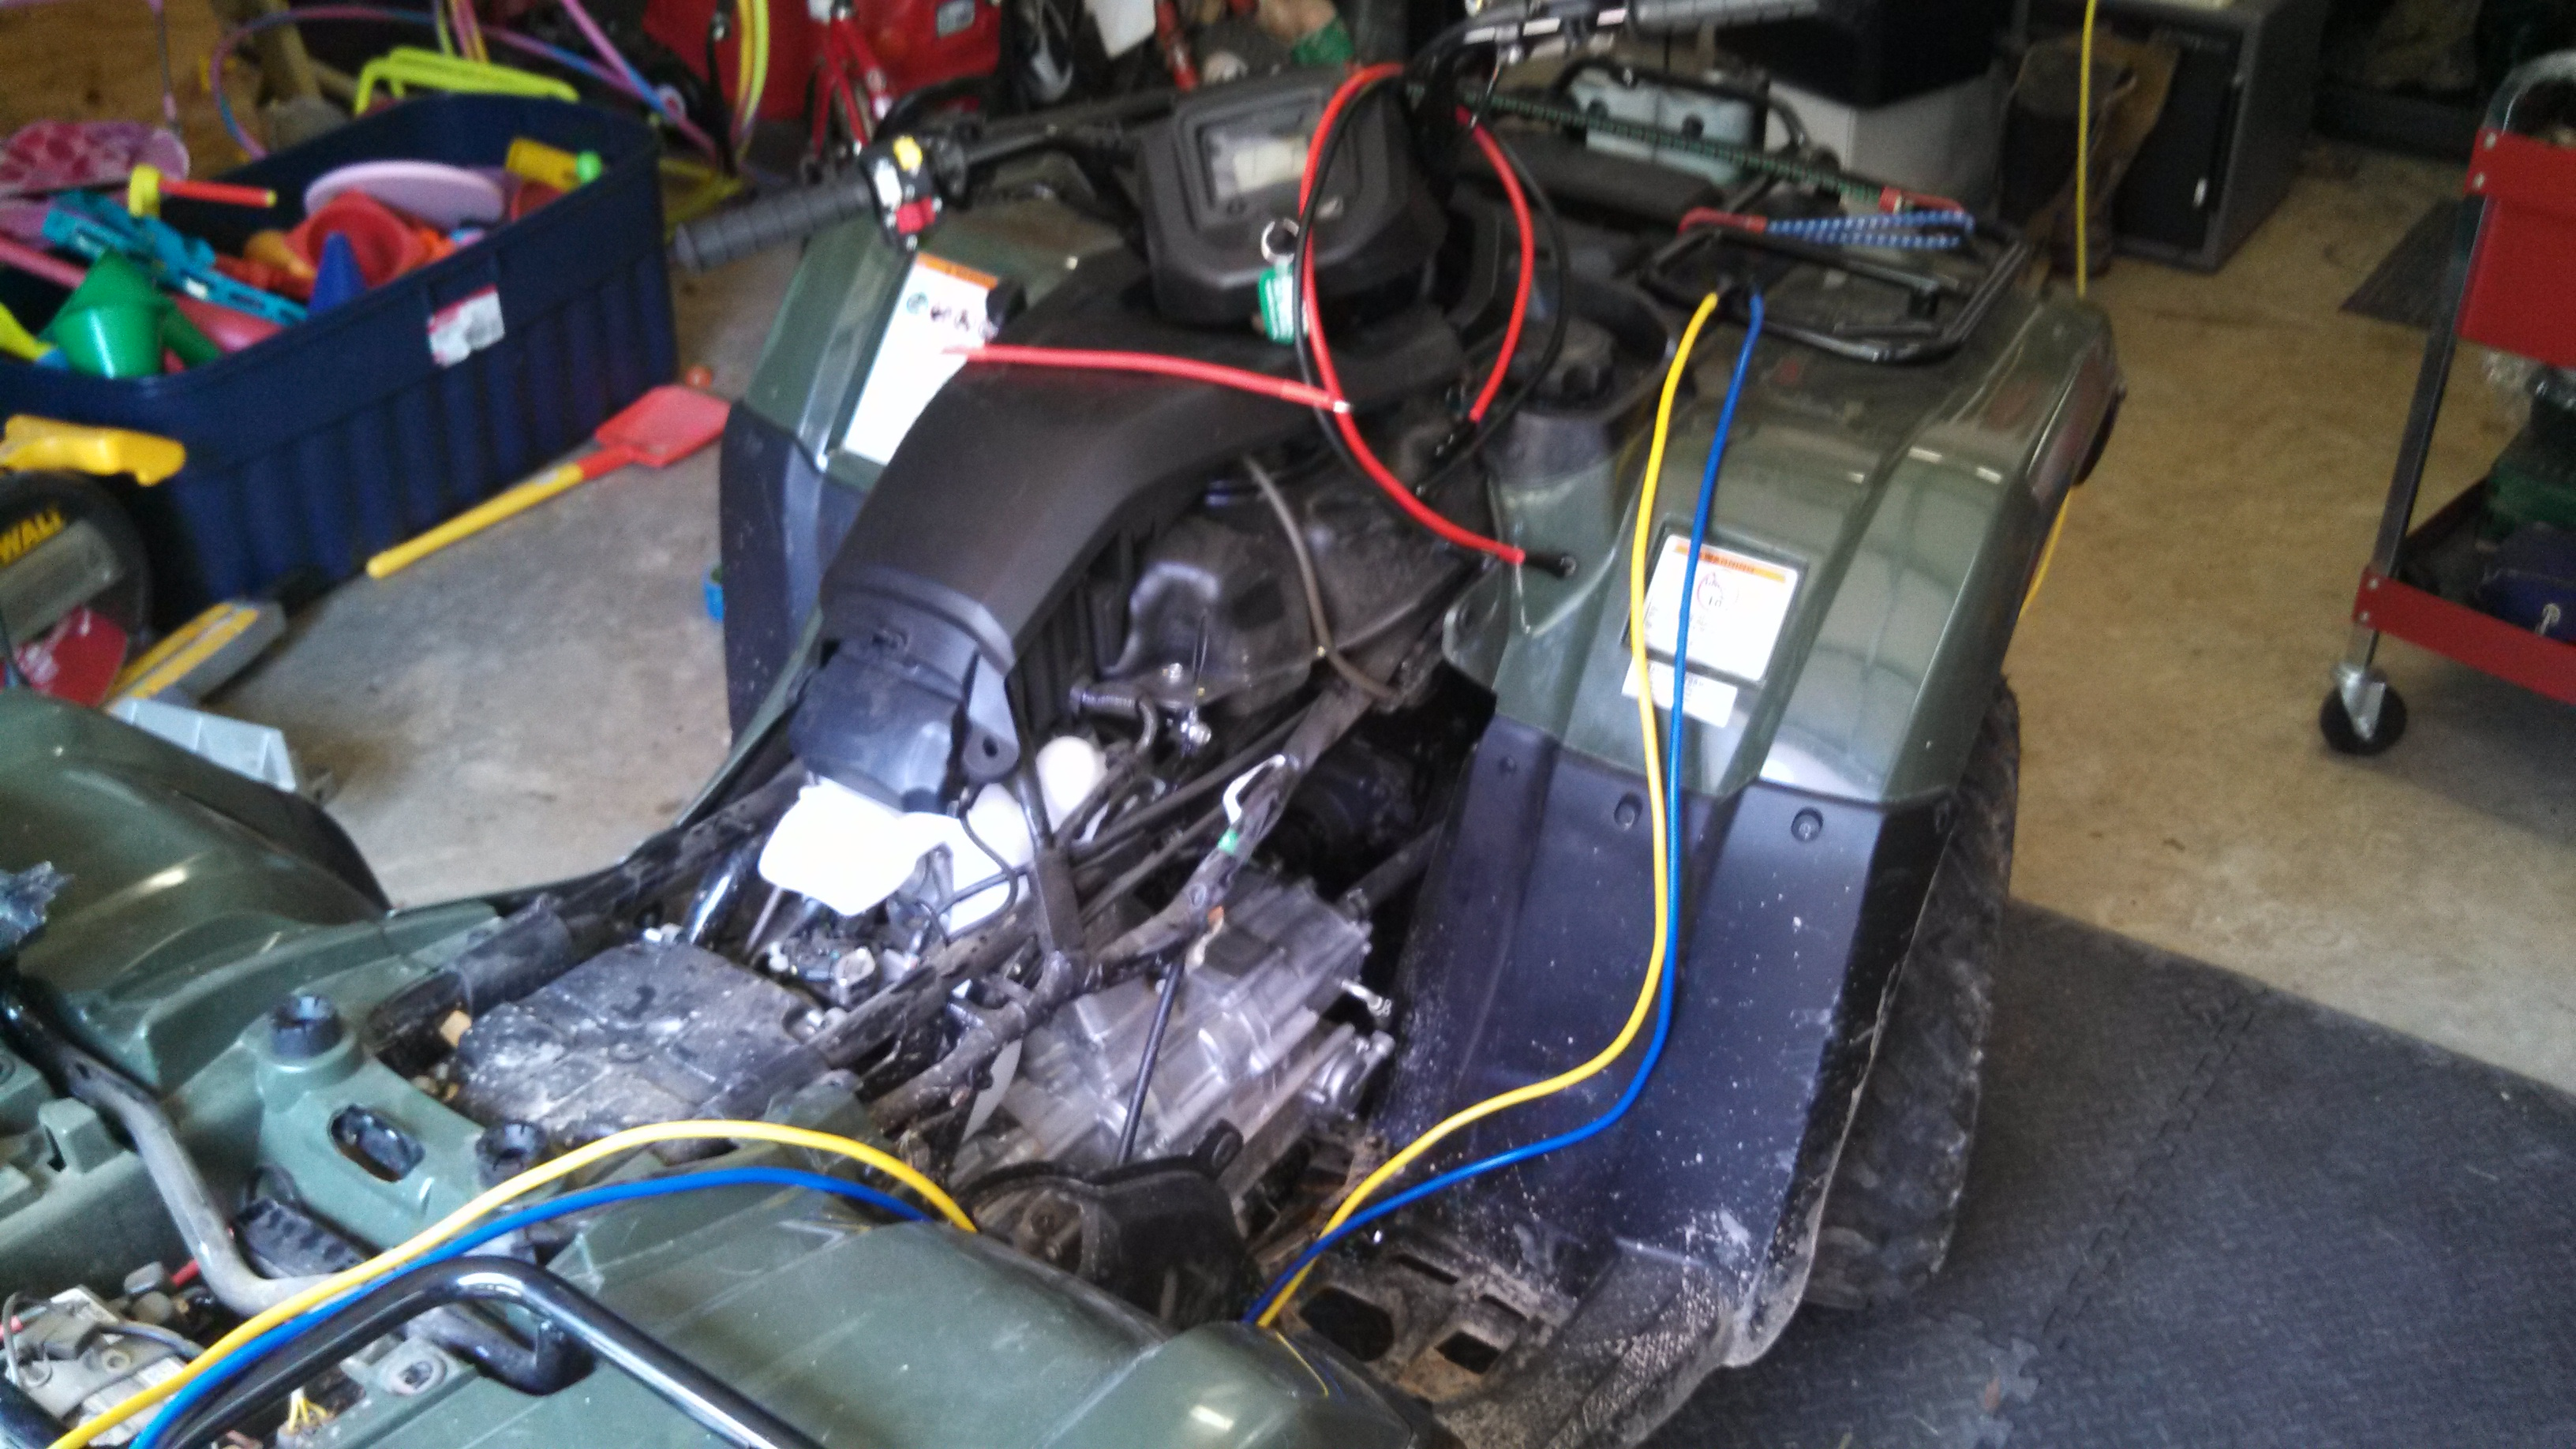 2015 Atv Warn Winch Wiring Detailed Diagrams Xt40 Diagram 2014 Rancher Fm1 Terra 35 Install Page 3 Honda Forum Switch